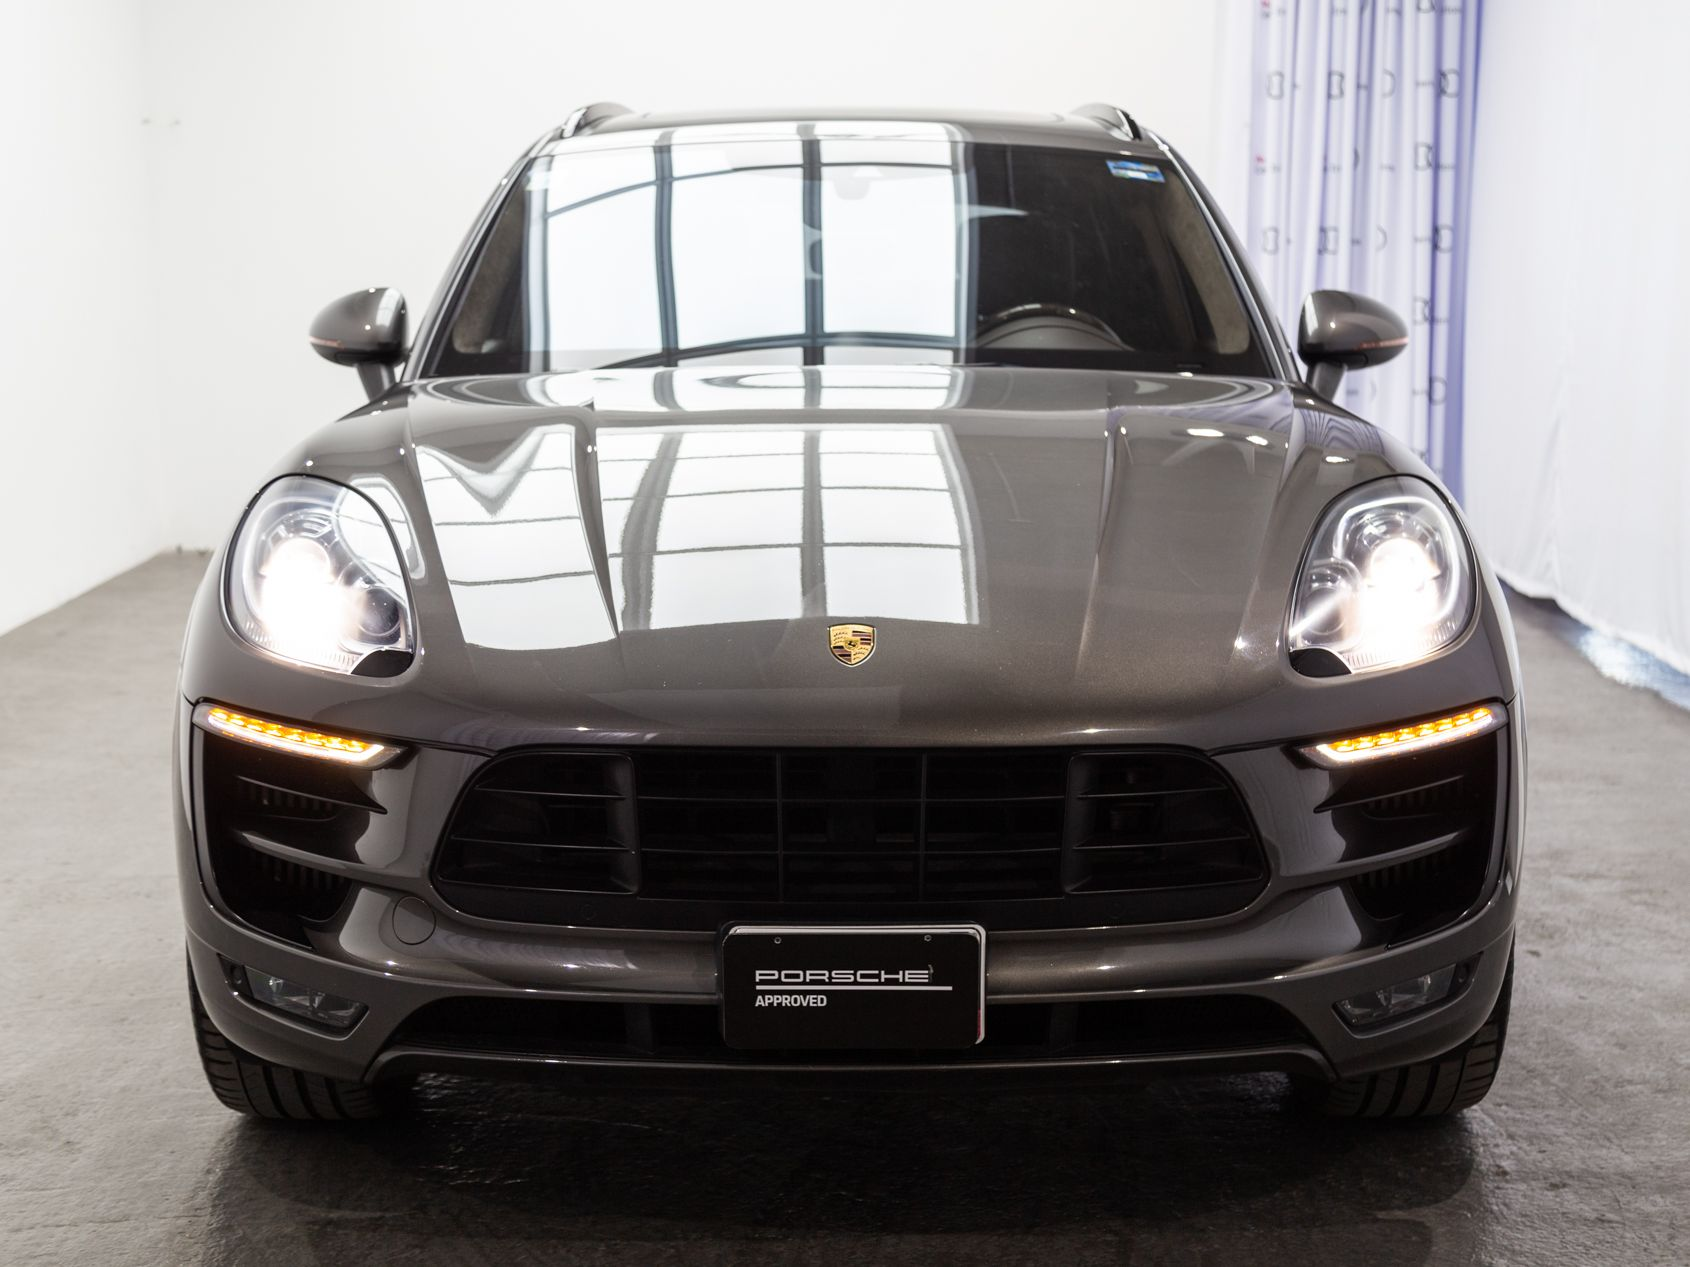 2016 Porsche Macan Turbo – 5